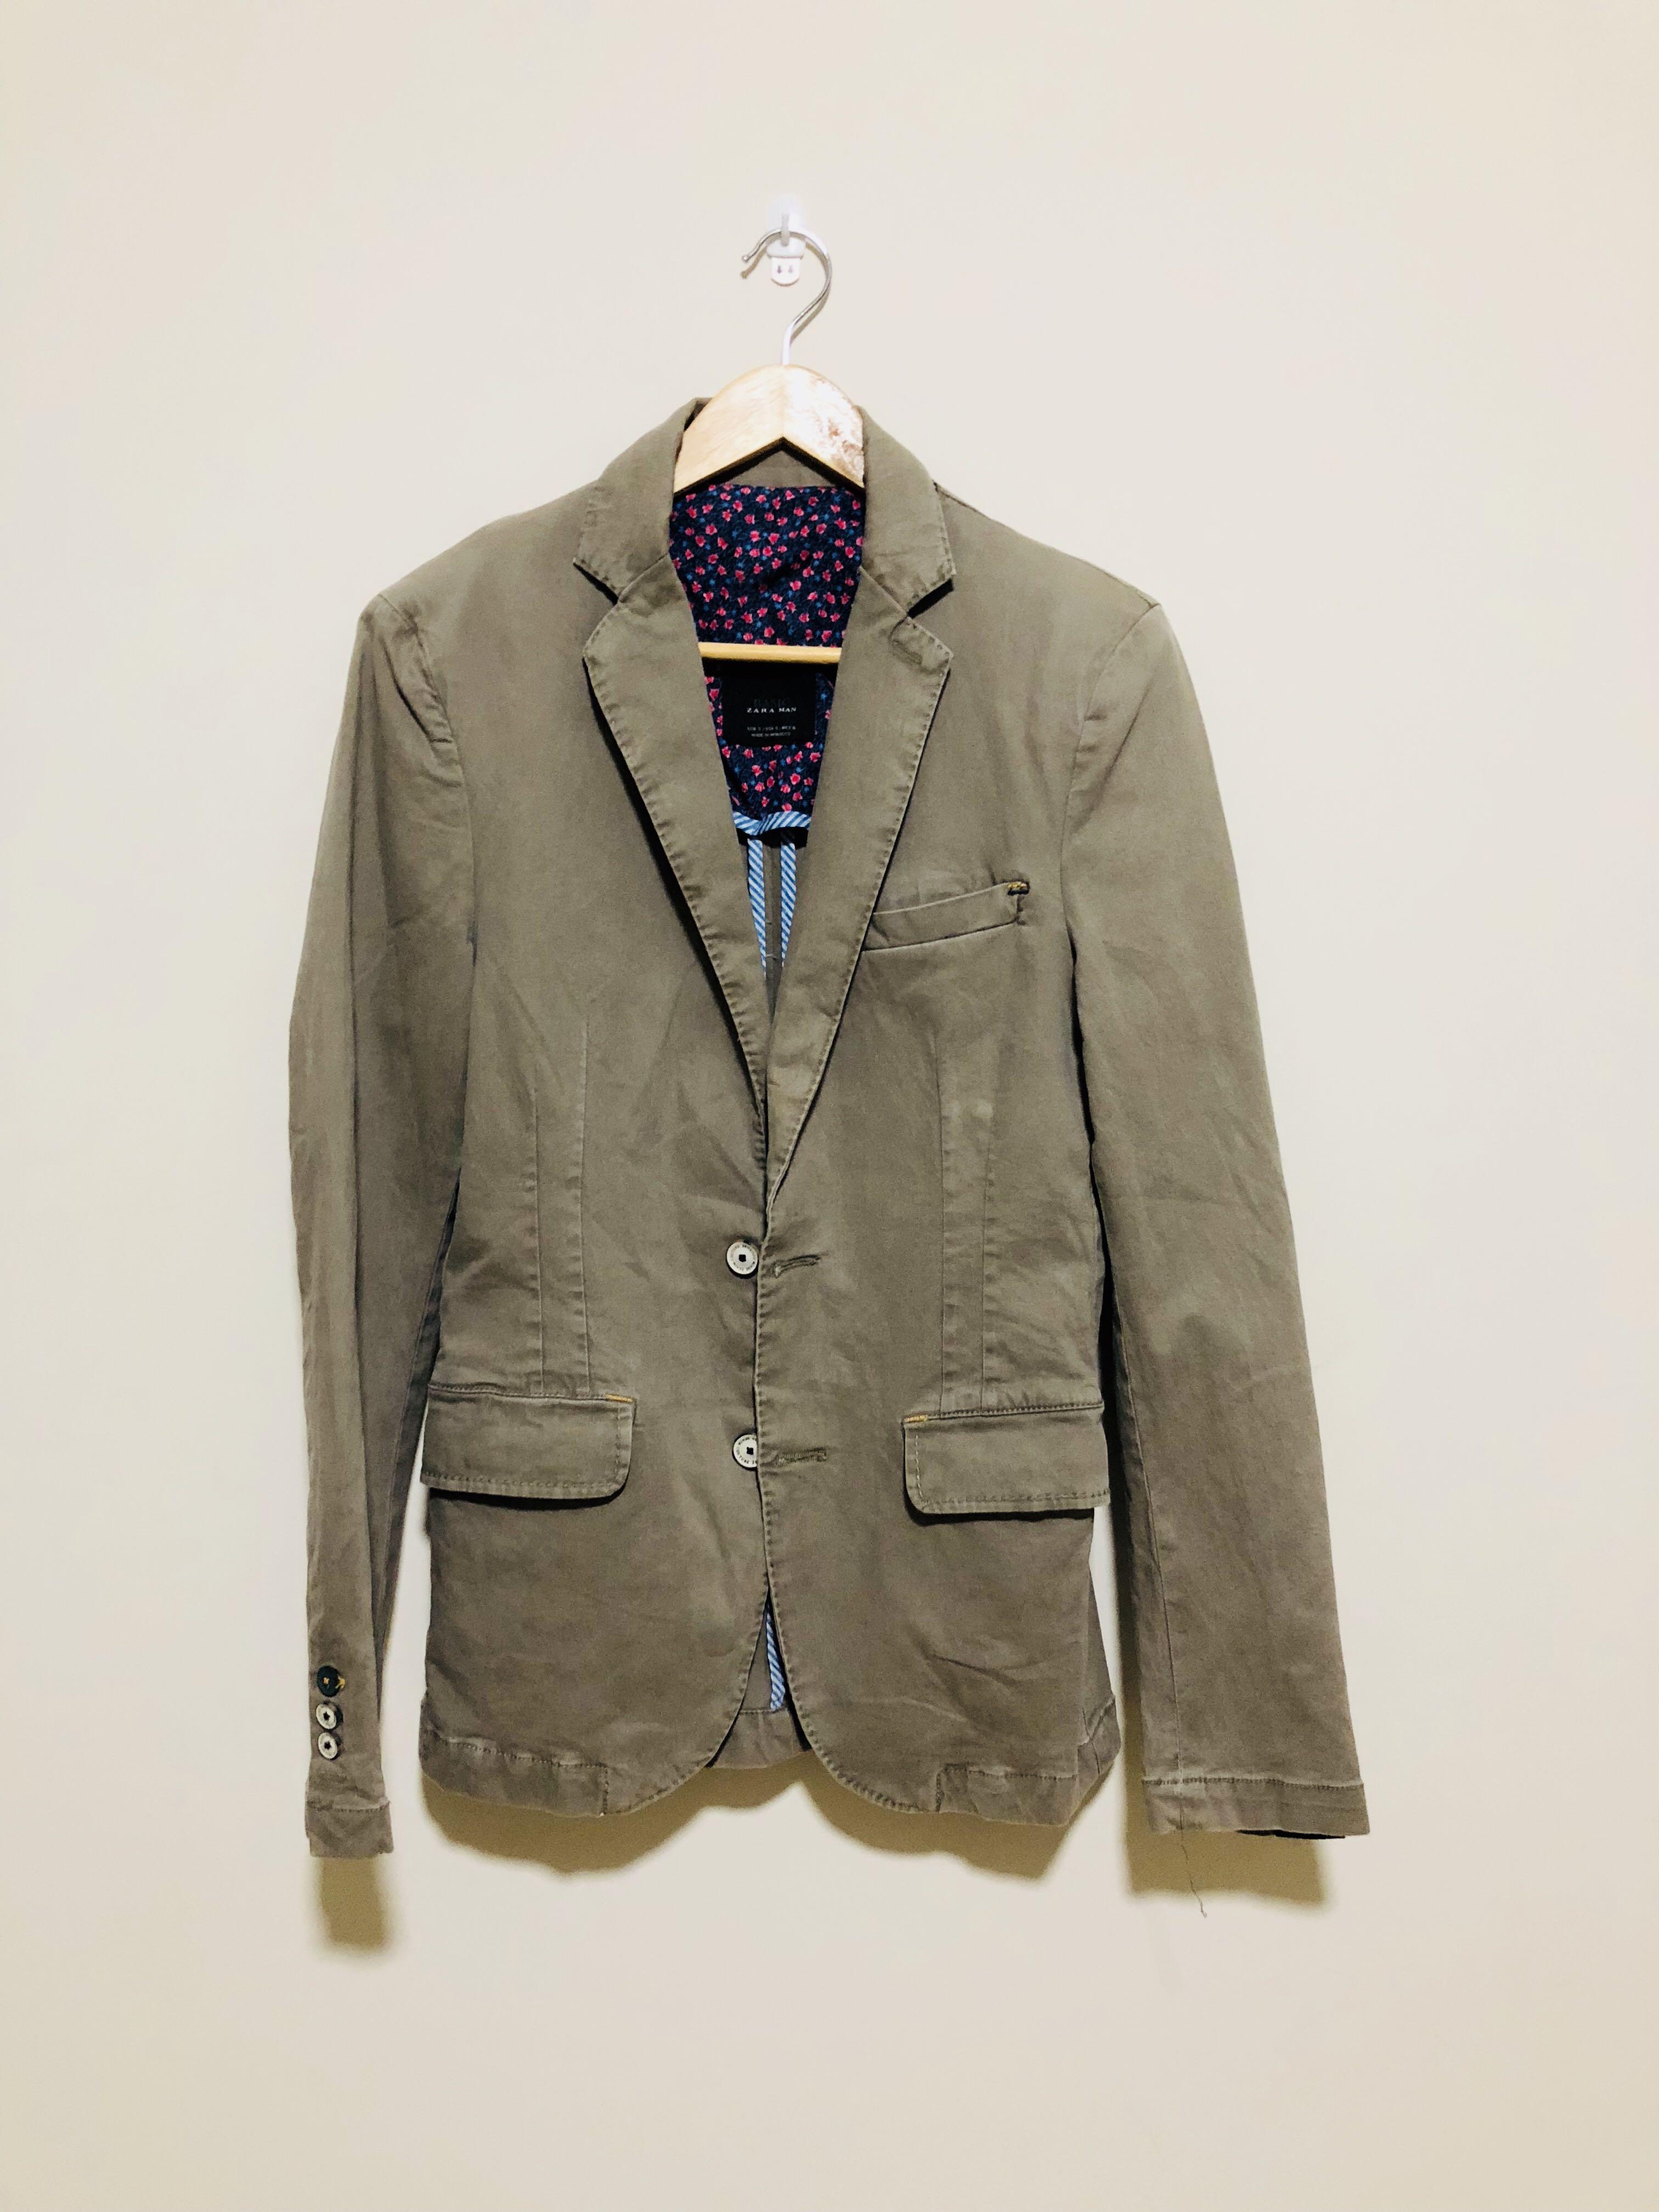 3111f79d Zara Man Basic Blazer, Men's Fashion, Clothes on Carousell